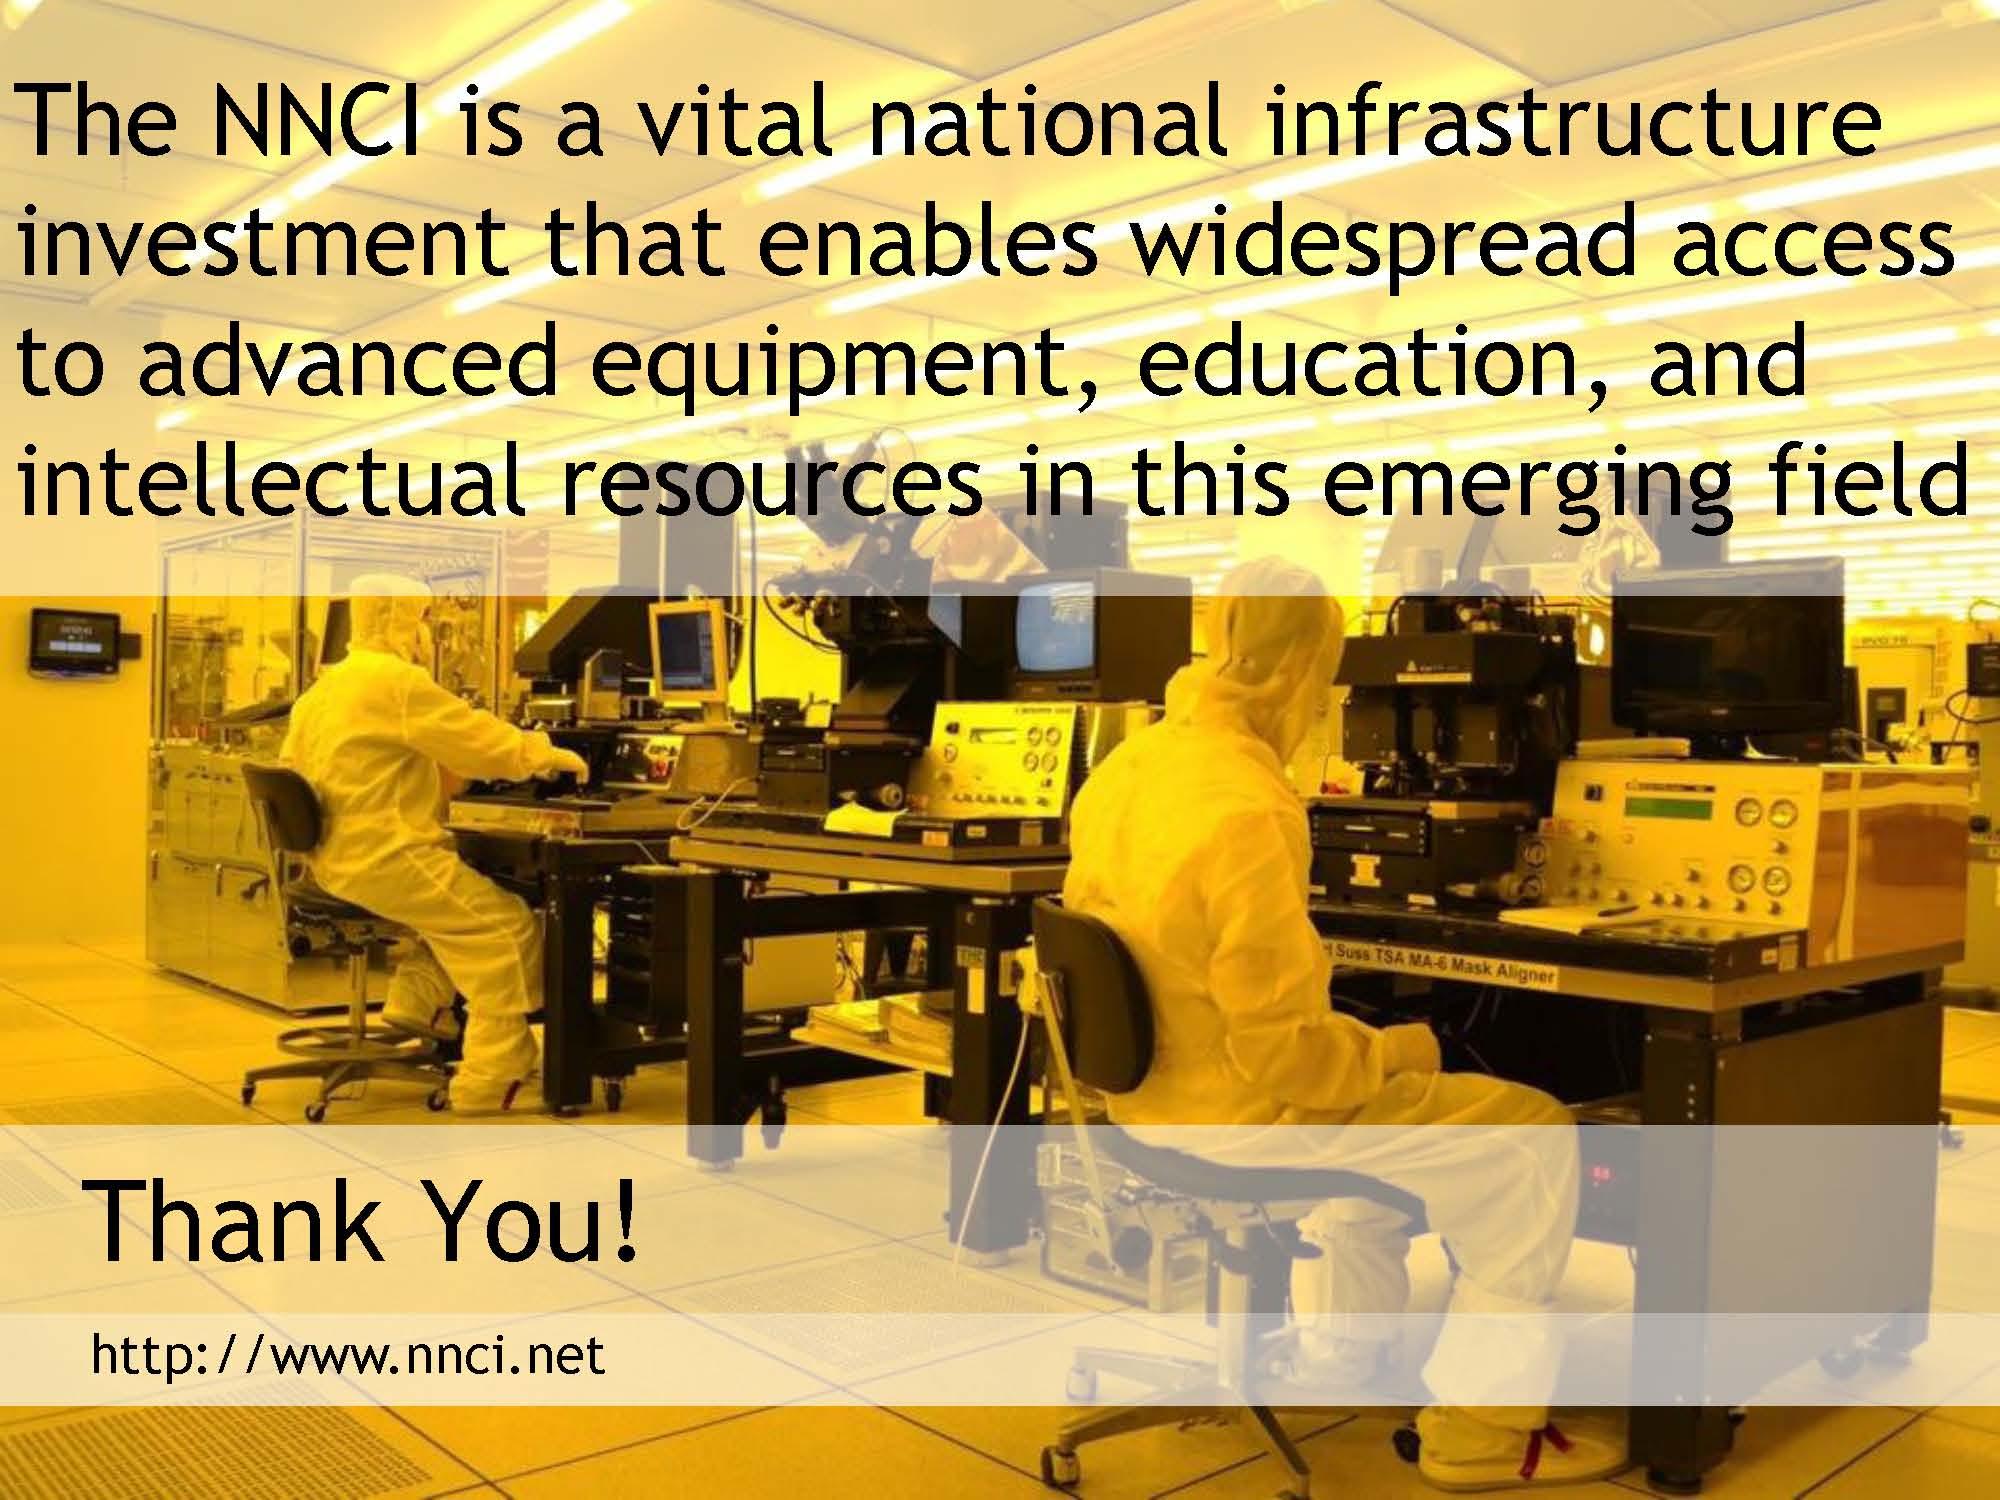 NSF 2017 NanoscienceGrantees Conf - NNCI presentation by Mark Allen_Page_20.jpg